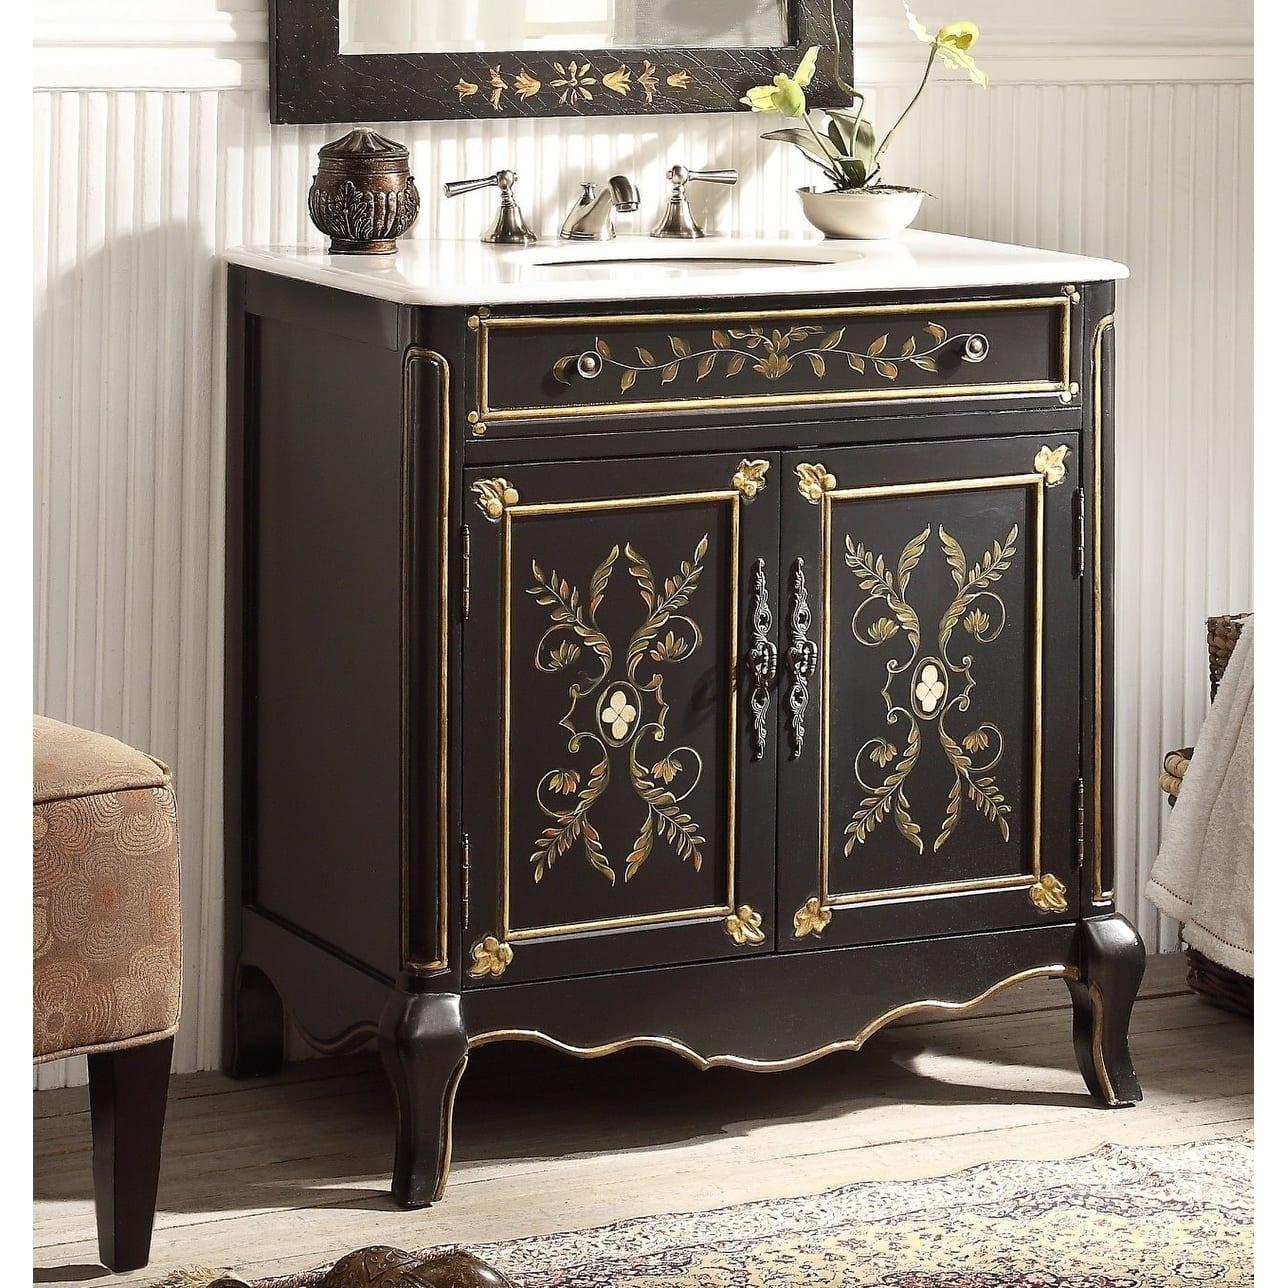 Buy Bathroom Vanities Amp Vanity Cabinets Online At